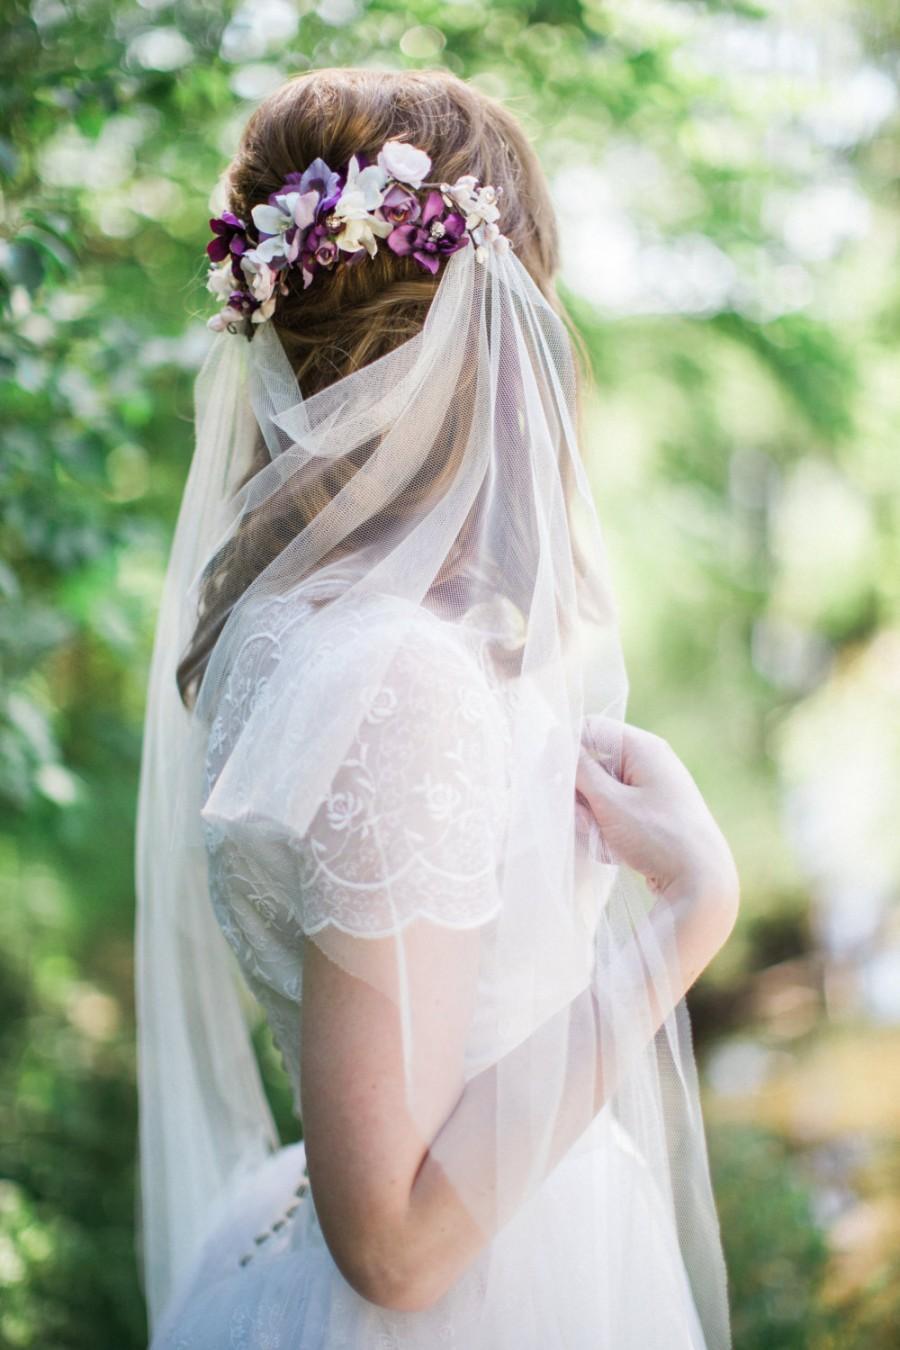 Boda - drape veil, boho veil, bohemian wedding veil, tulle veil, bridal veils and headpieces, wedding veil, ivory bridal veil, veil only